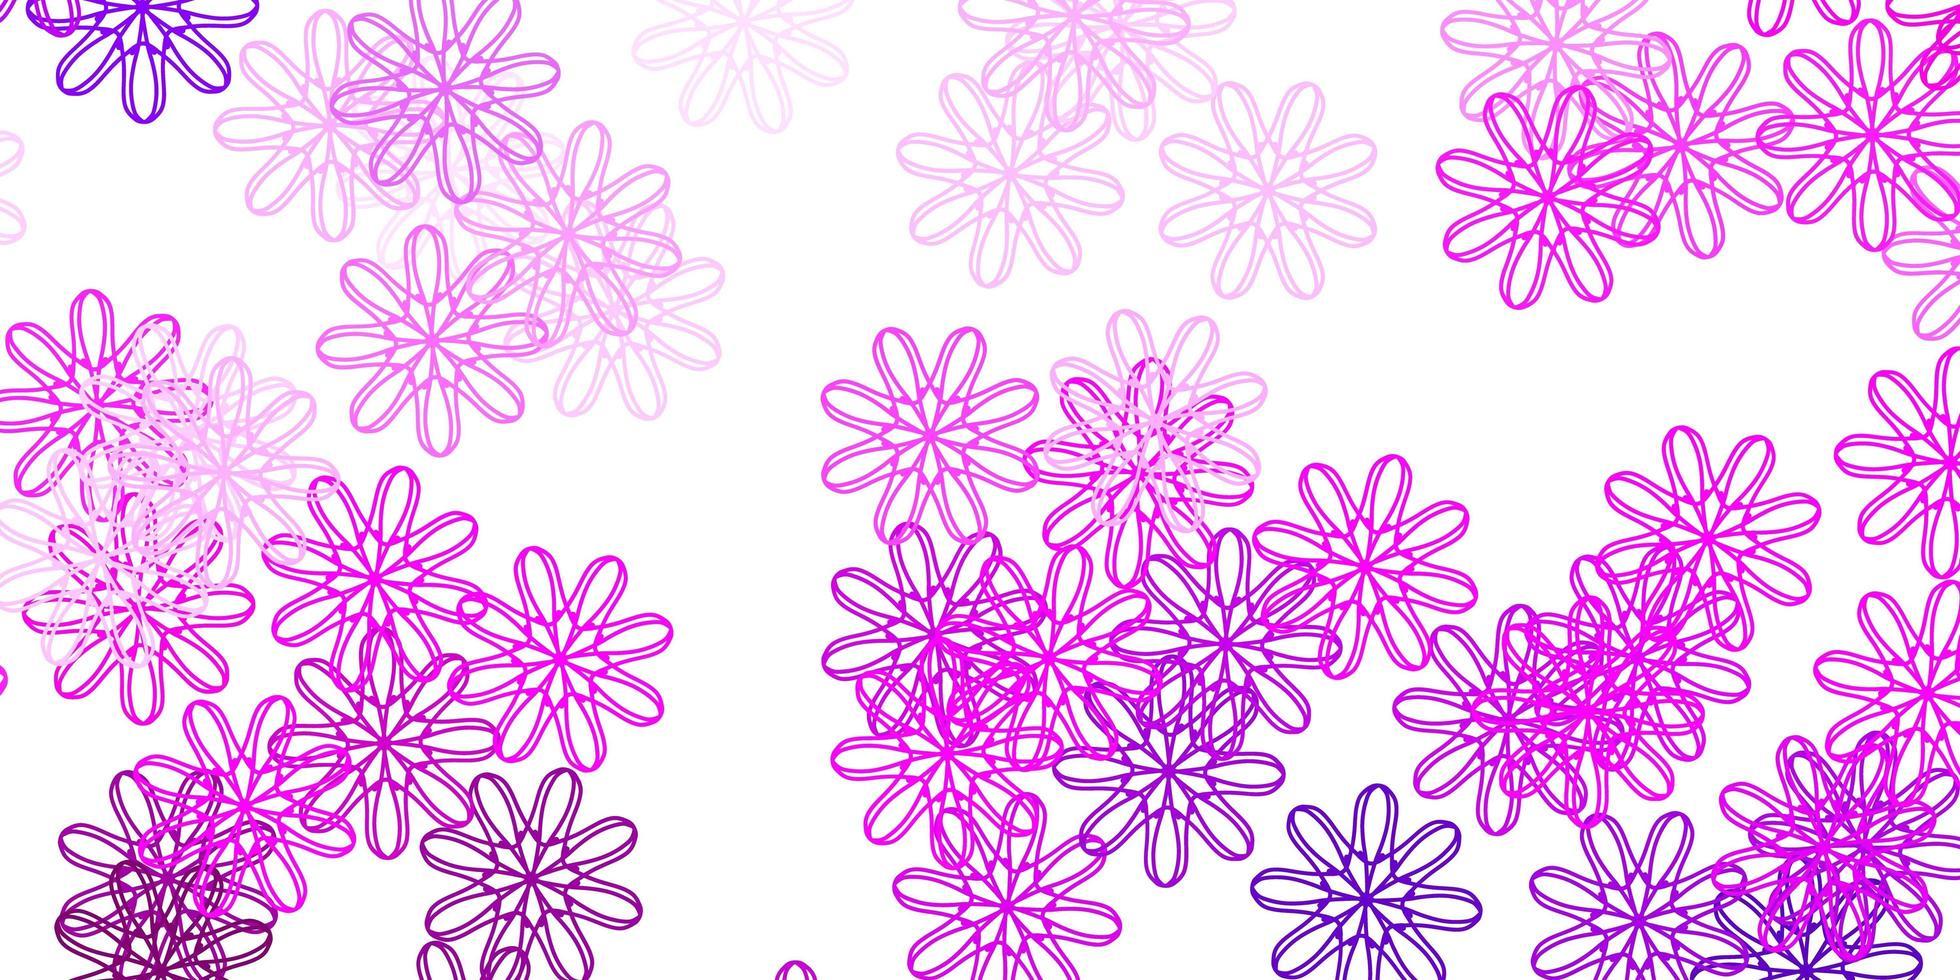 patrón de doodle de vector púrpura claro, rosa con flores.